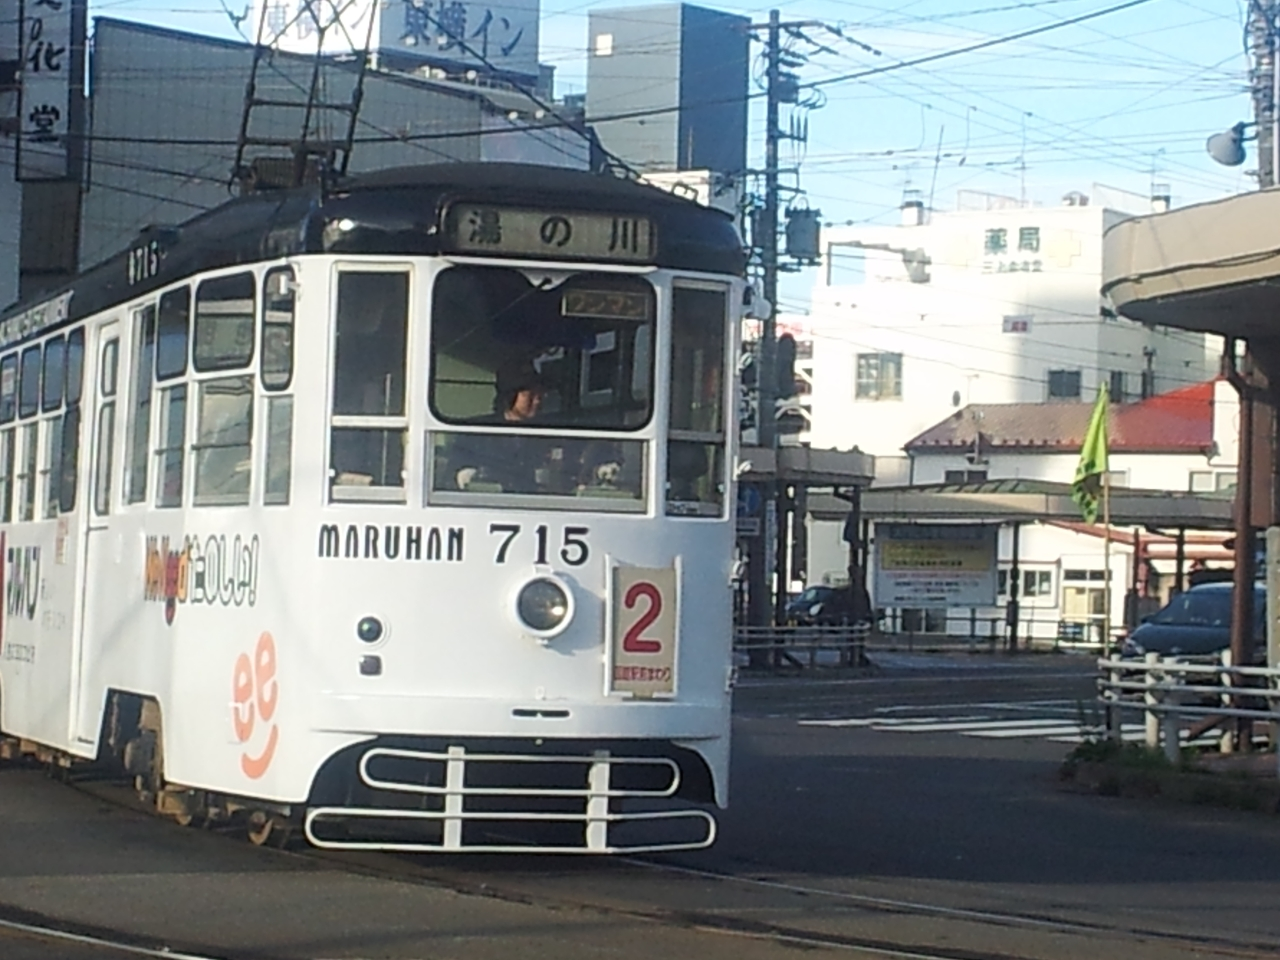 20121110_082028